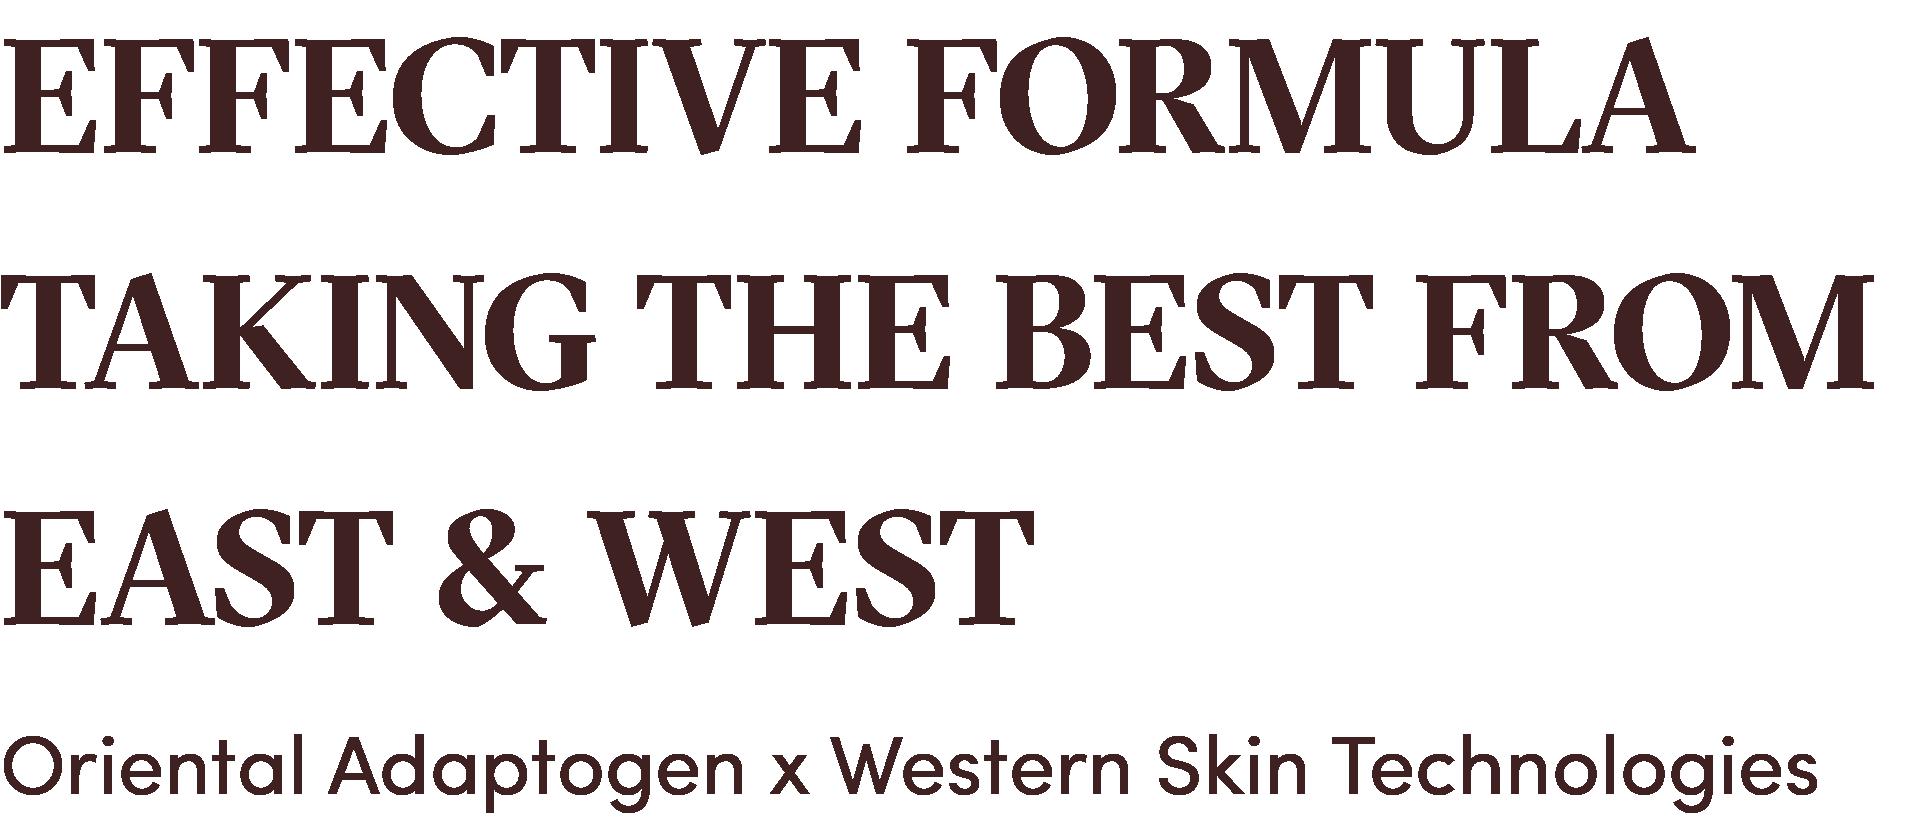 Botanic Pretti5_Effective Formula